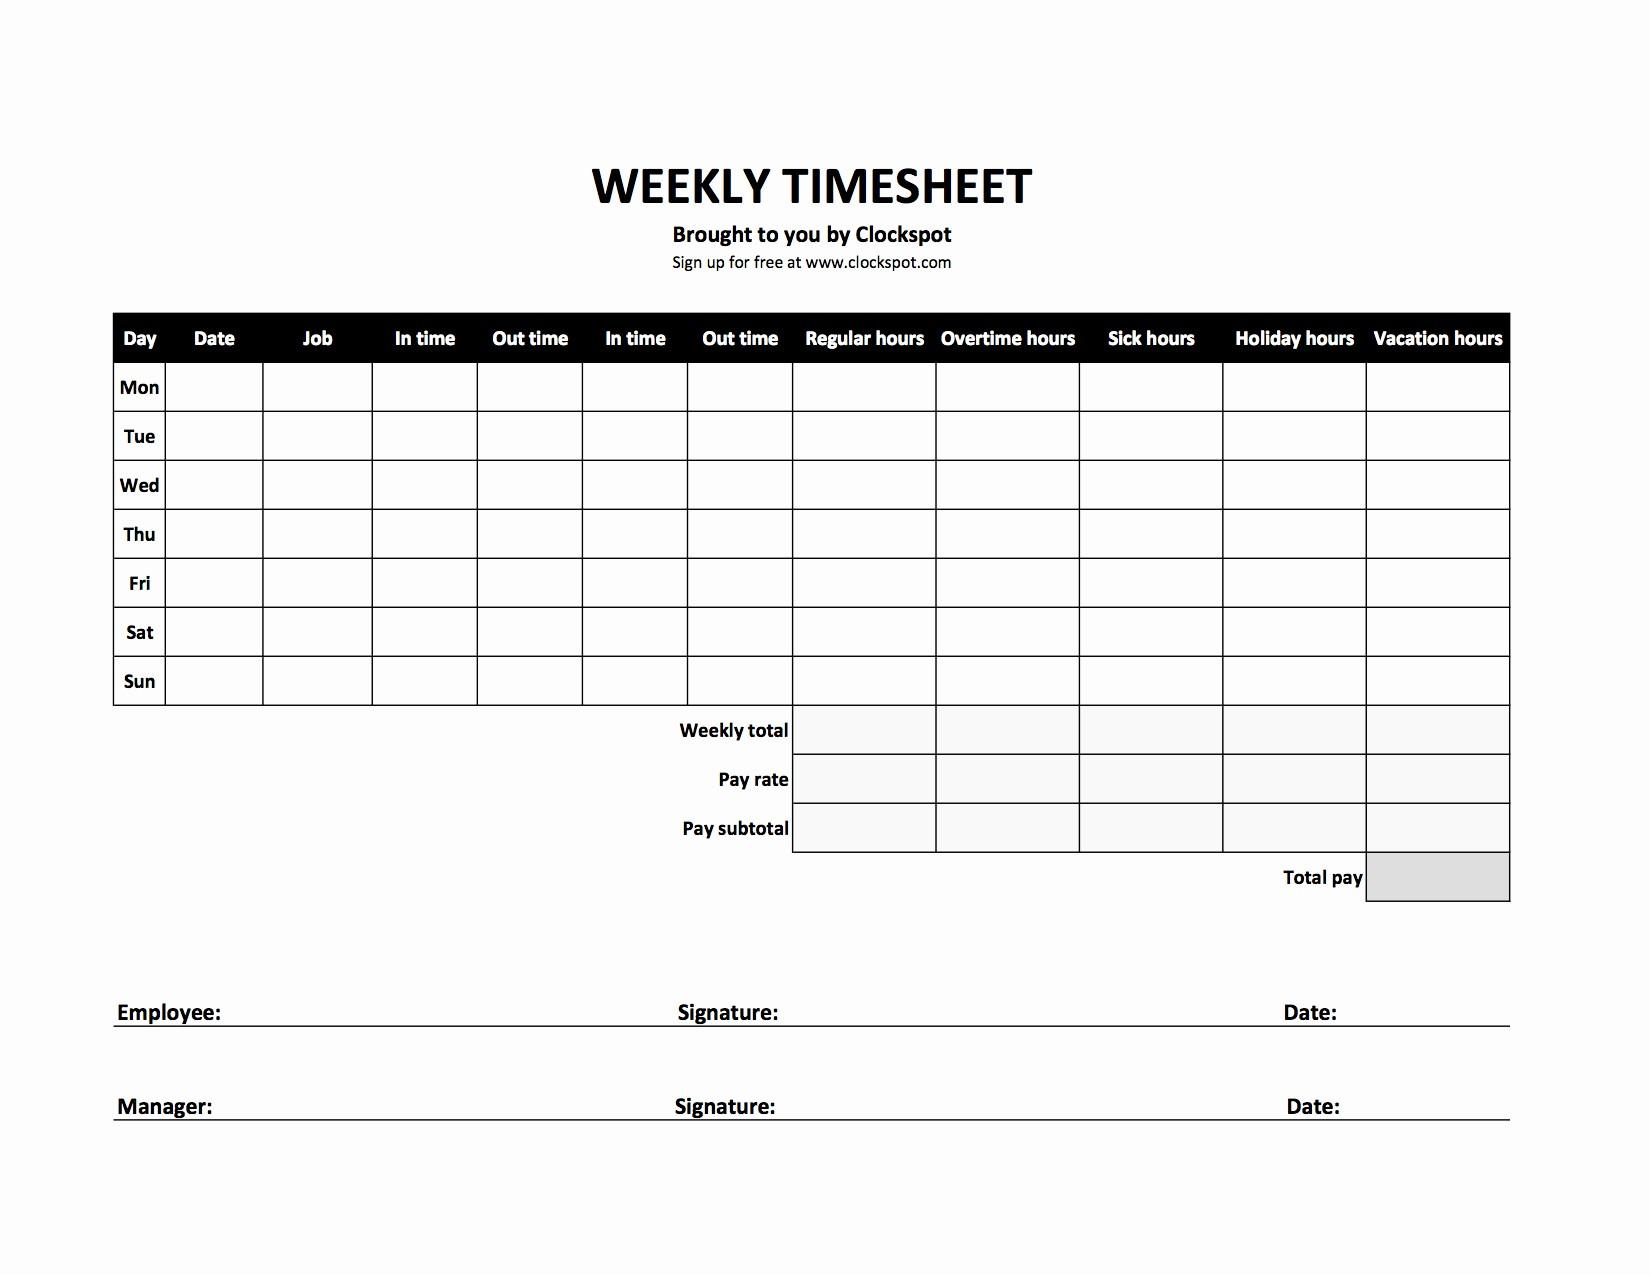 Free Employee Time Tracking Spreadsheet Luxury Employee Error Tracking Spreadsheet for Free Time Tracking